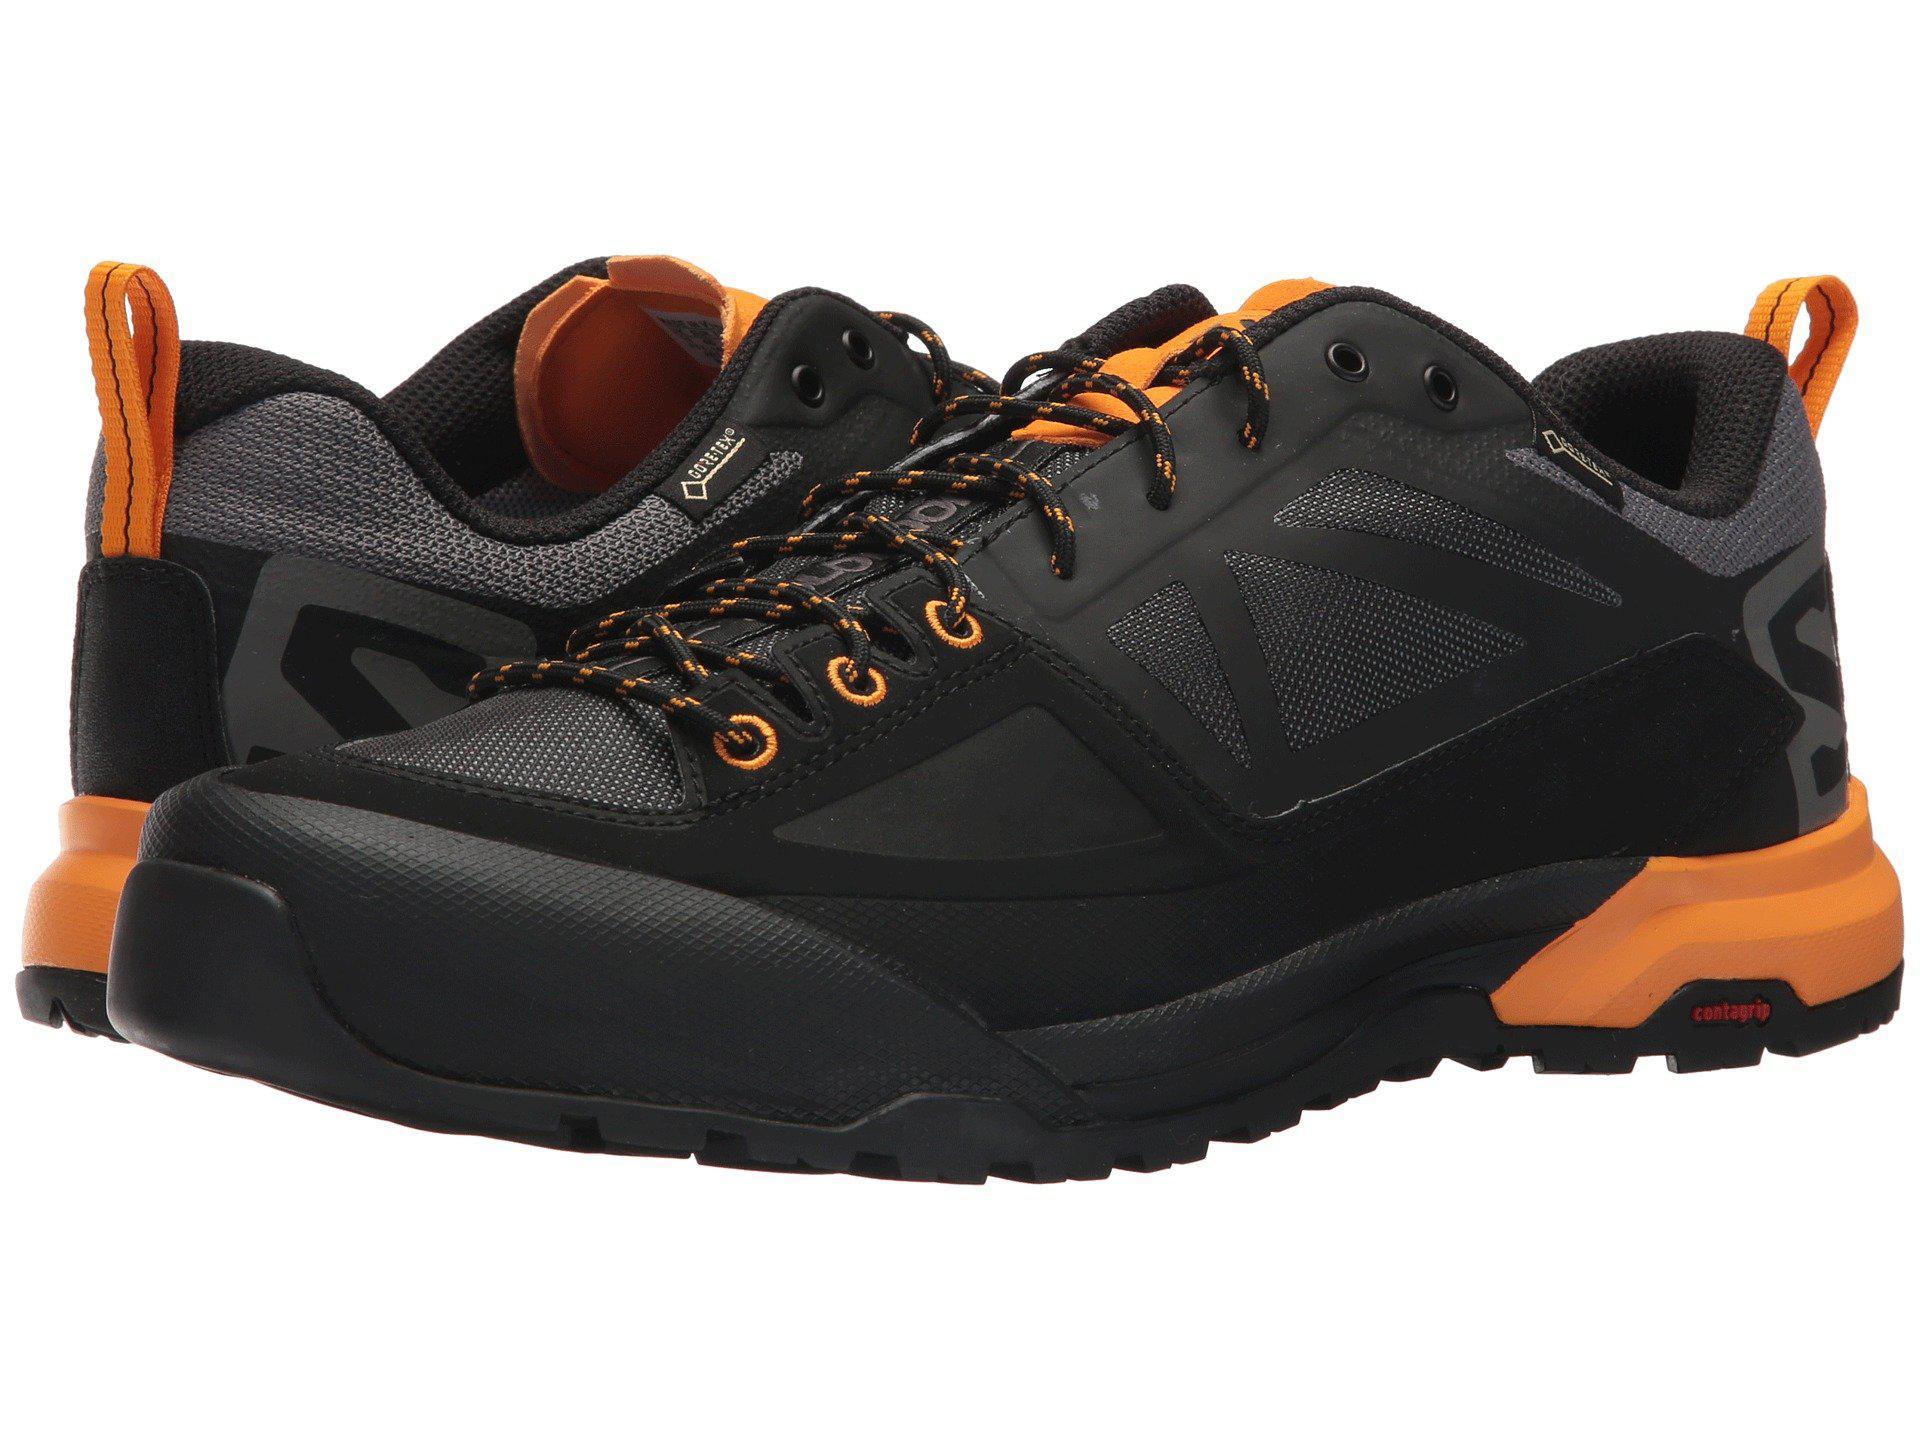 75022fbc3b35 Lyst - Yves Salomon X Alp Spry Gtx® in Black for Men